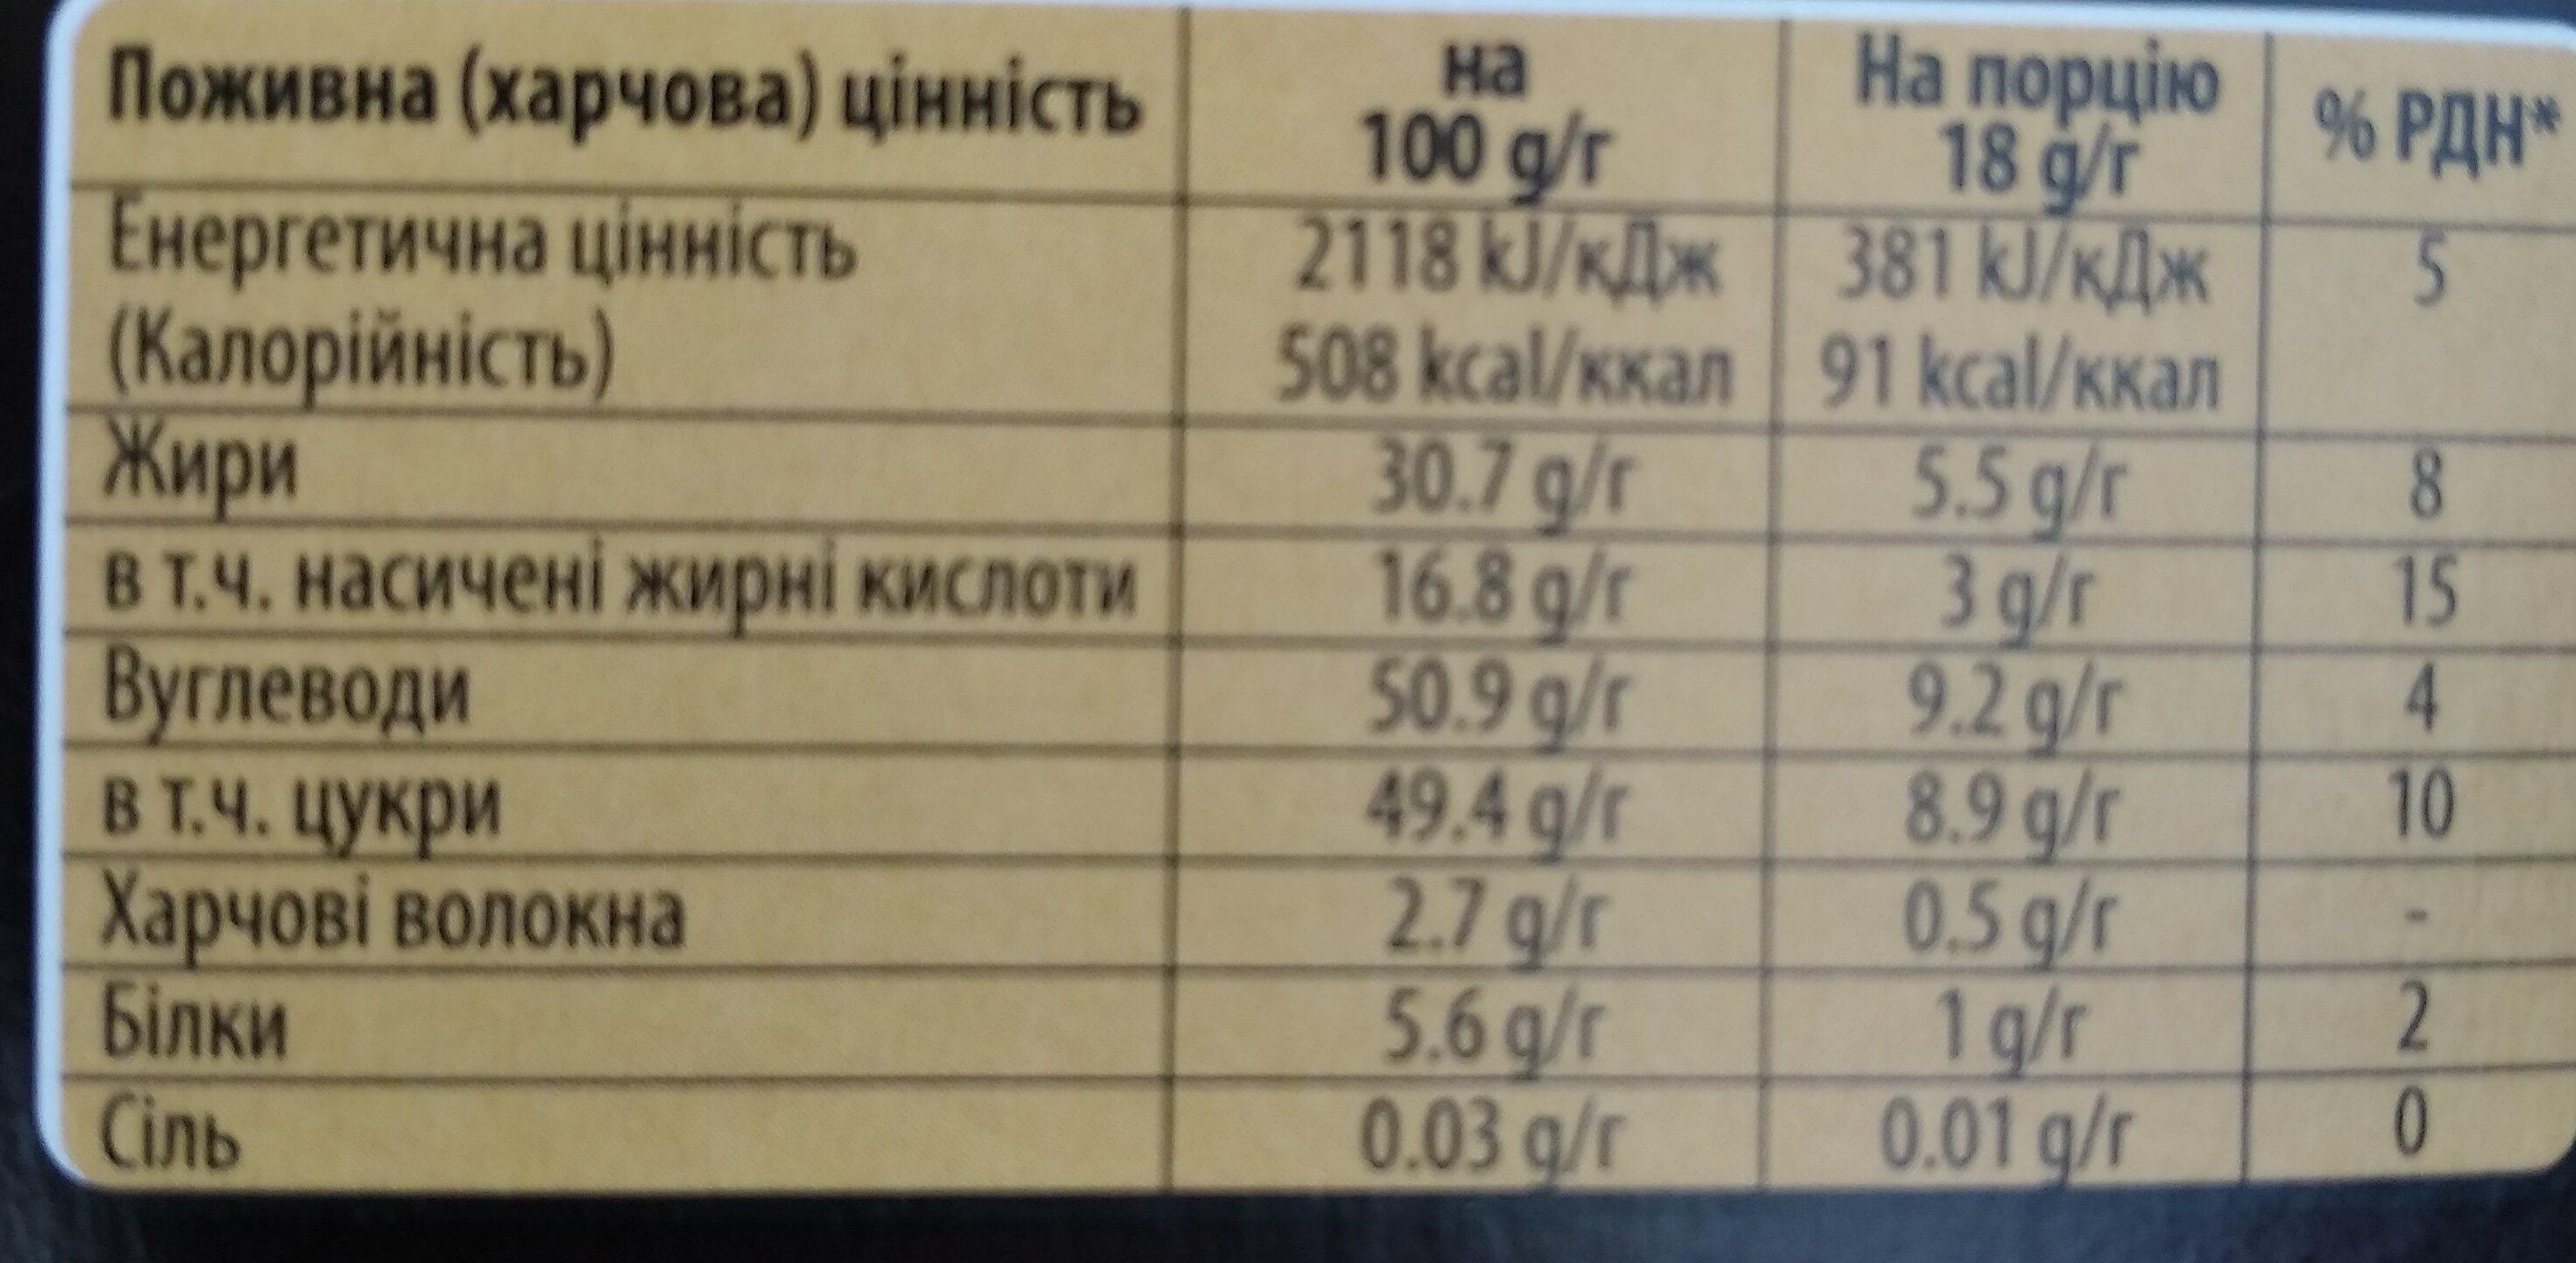 svitoch chocolate black trufel - Voedingswaarden - en